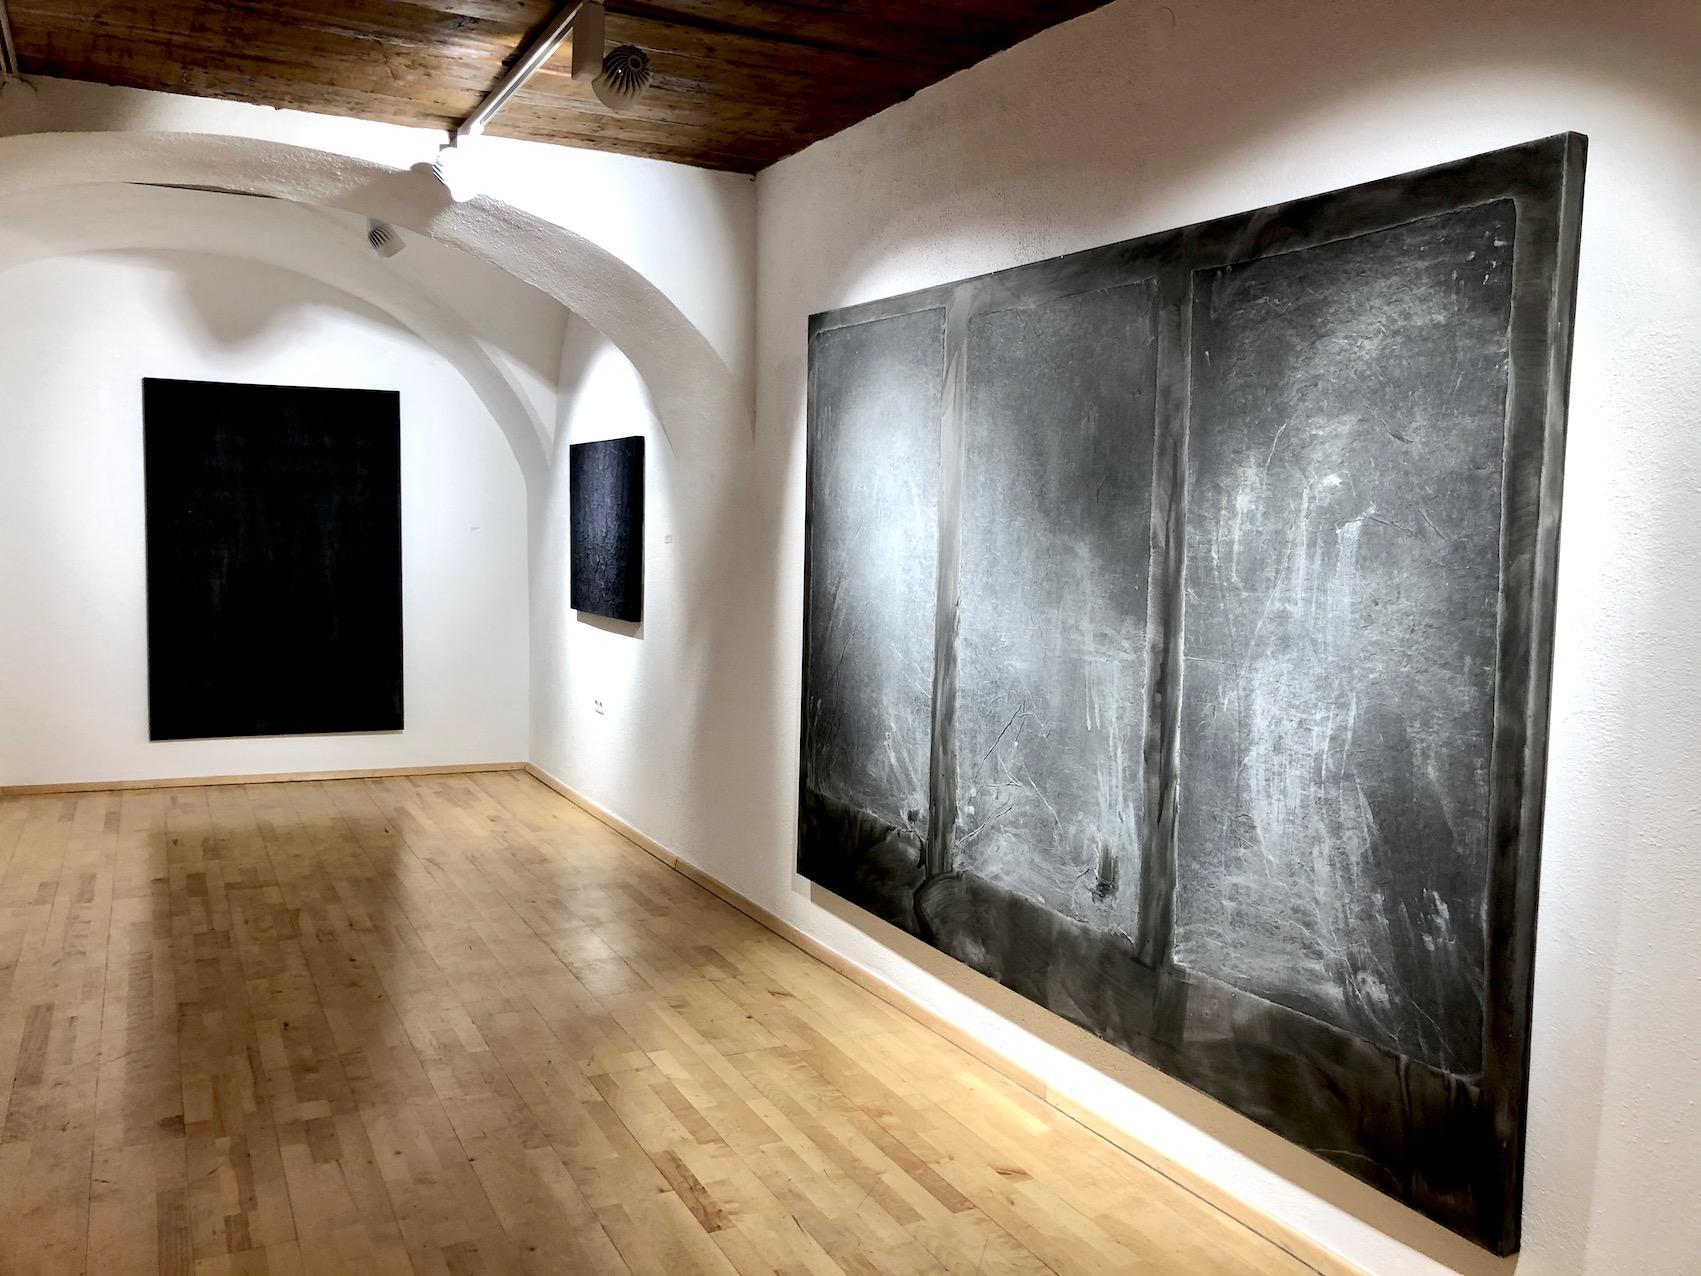 Ausstellung_Rudi Stanzel_Galerie Frank Wien